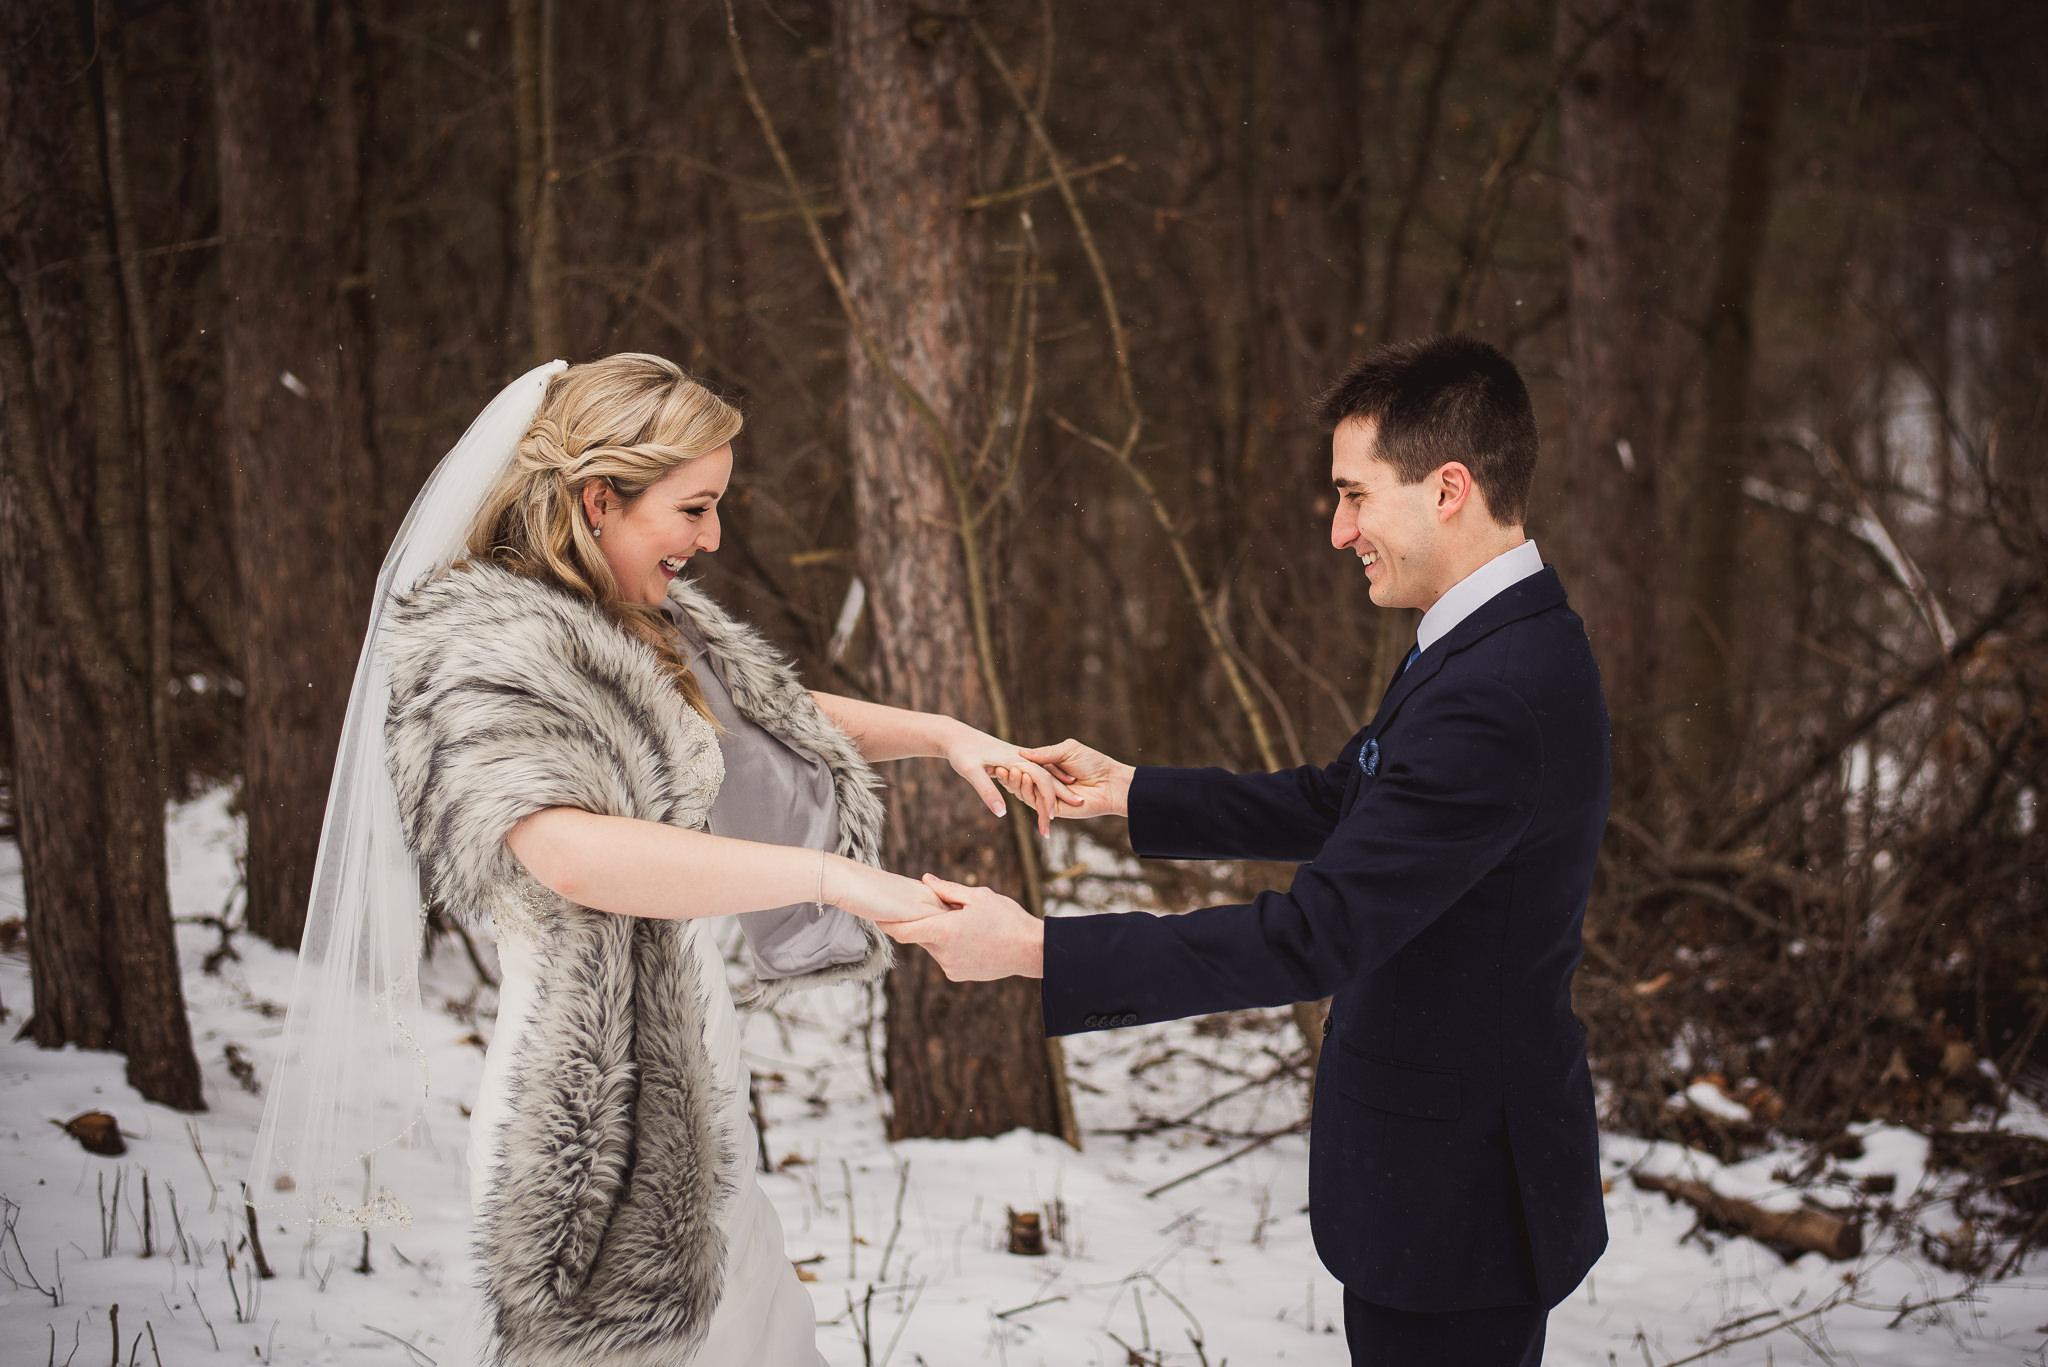 kortright center winter wedding photos 137 - Kortright Center Winter Wedding Photos